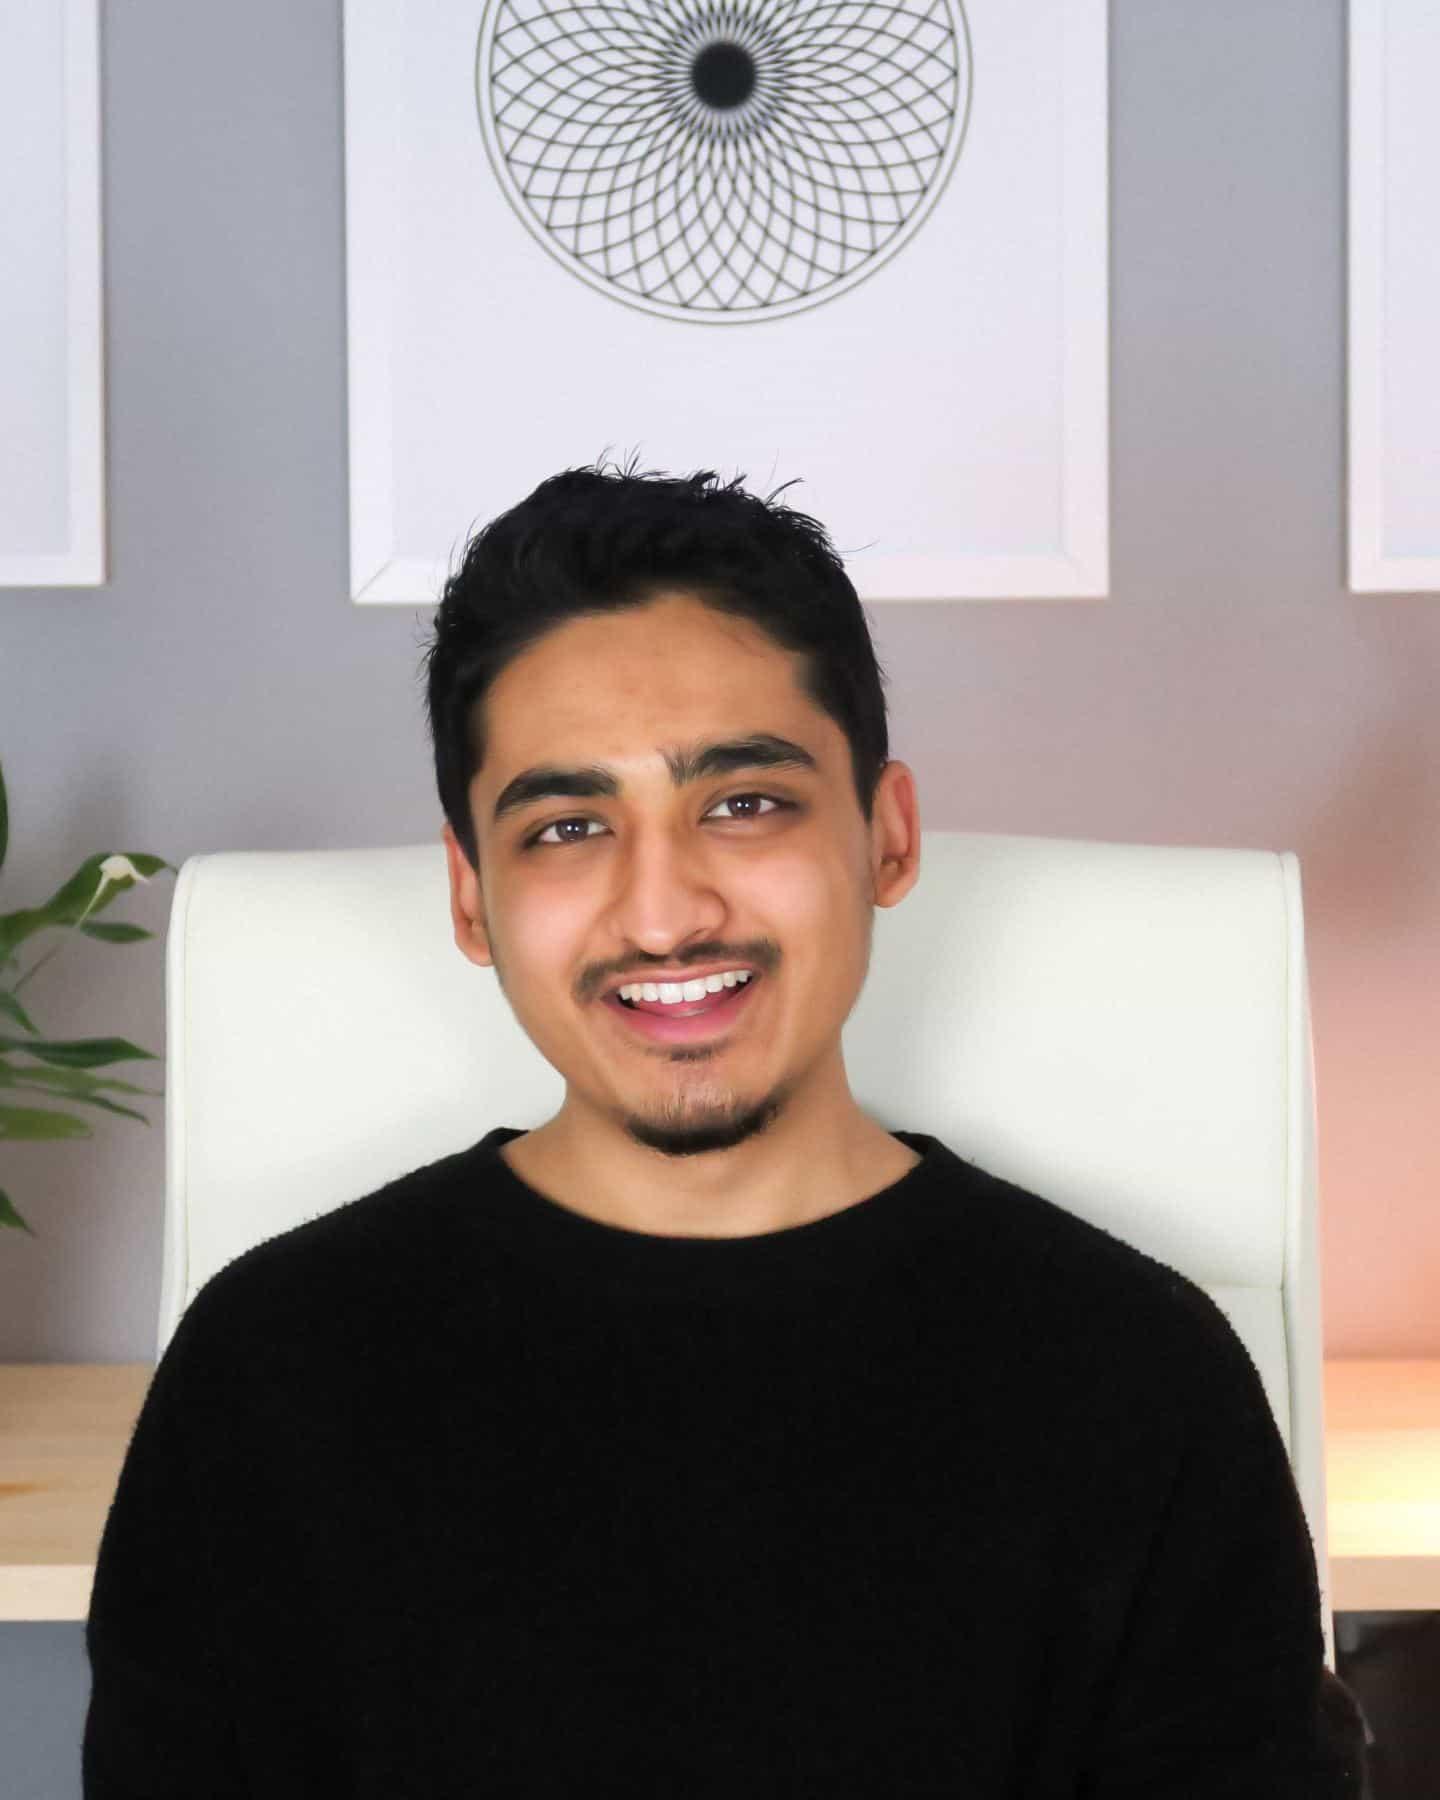 Designer Maker Nihal Shah